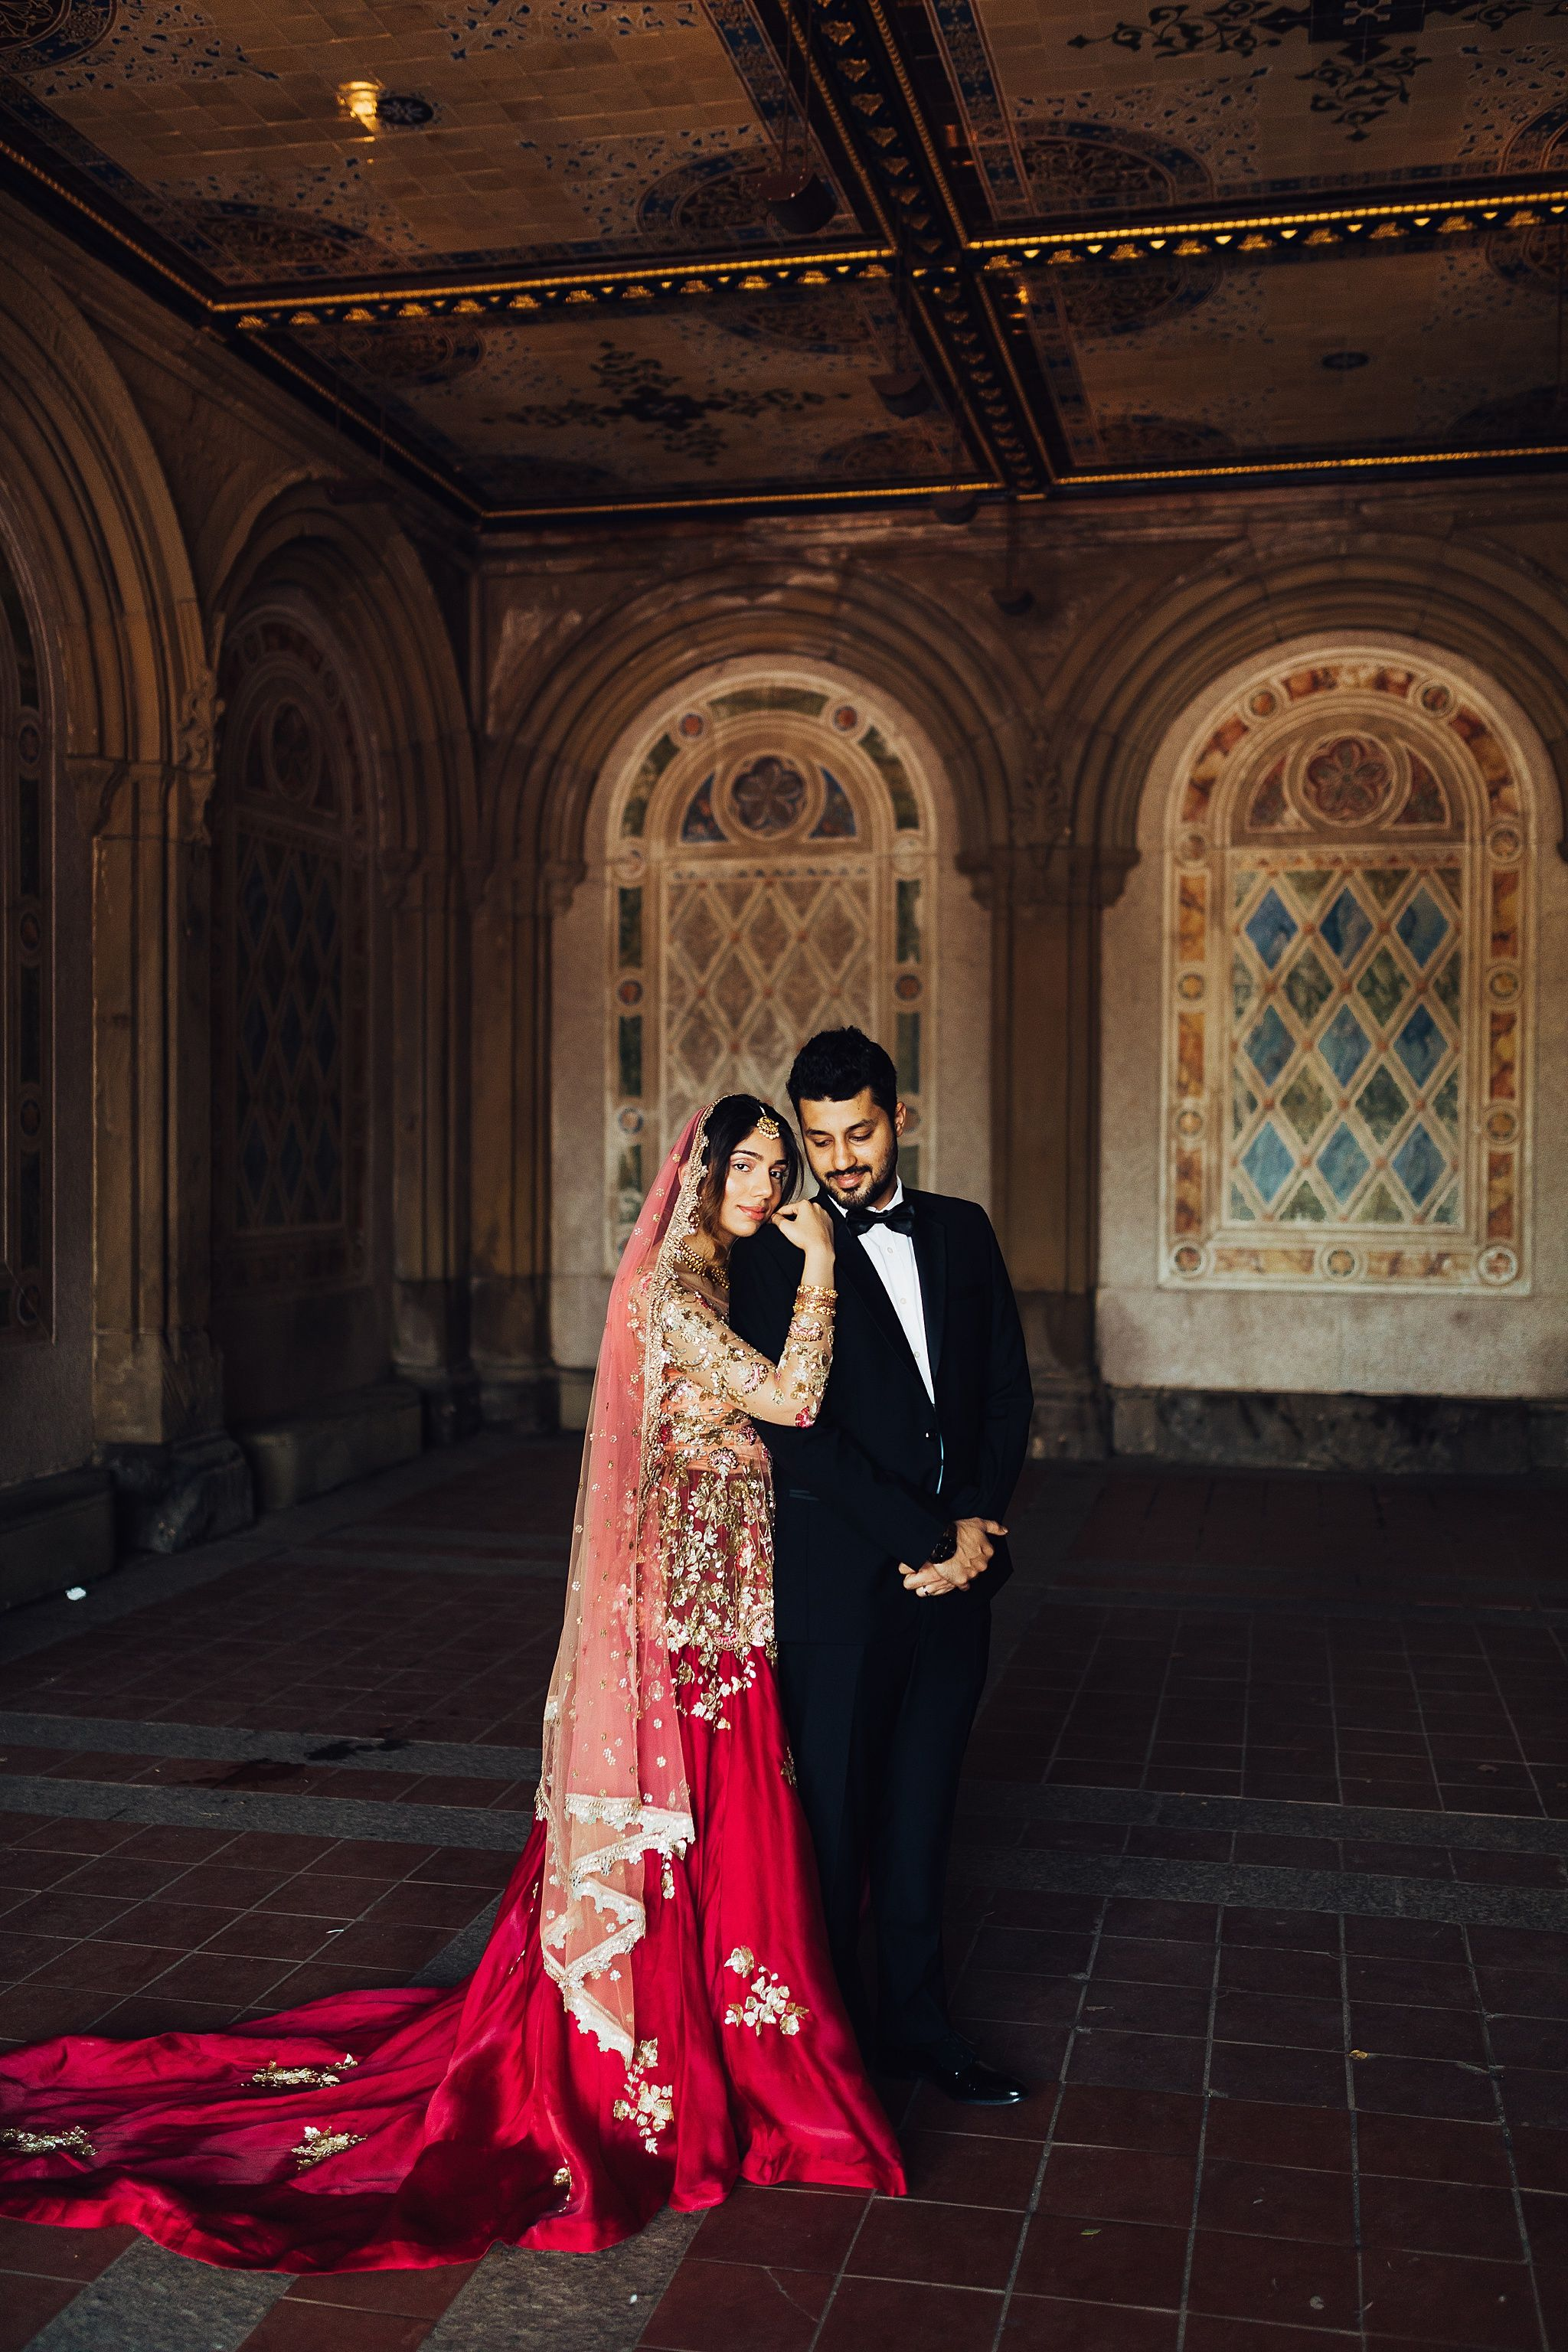 Jamal Sanah Nyc Central Park Indian Wedding Wedding Couple Poses Indian Wedding Couple Wedding Poses